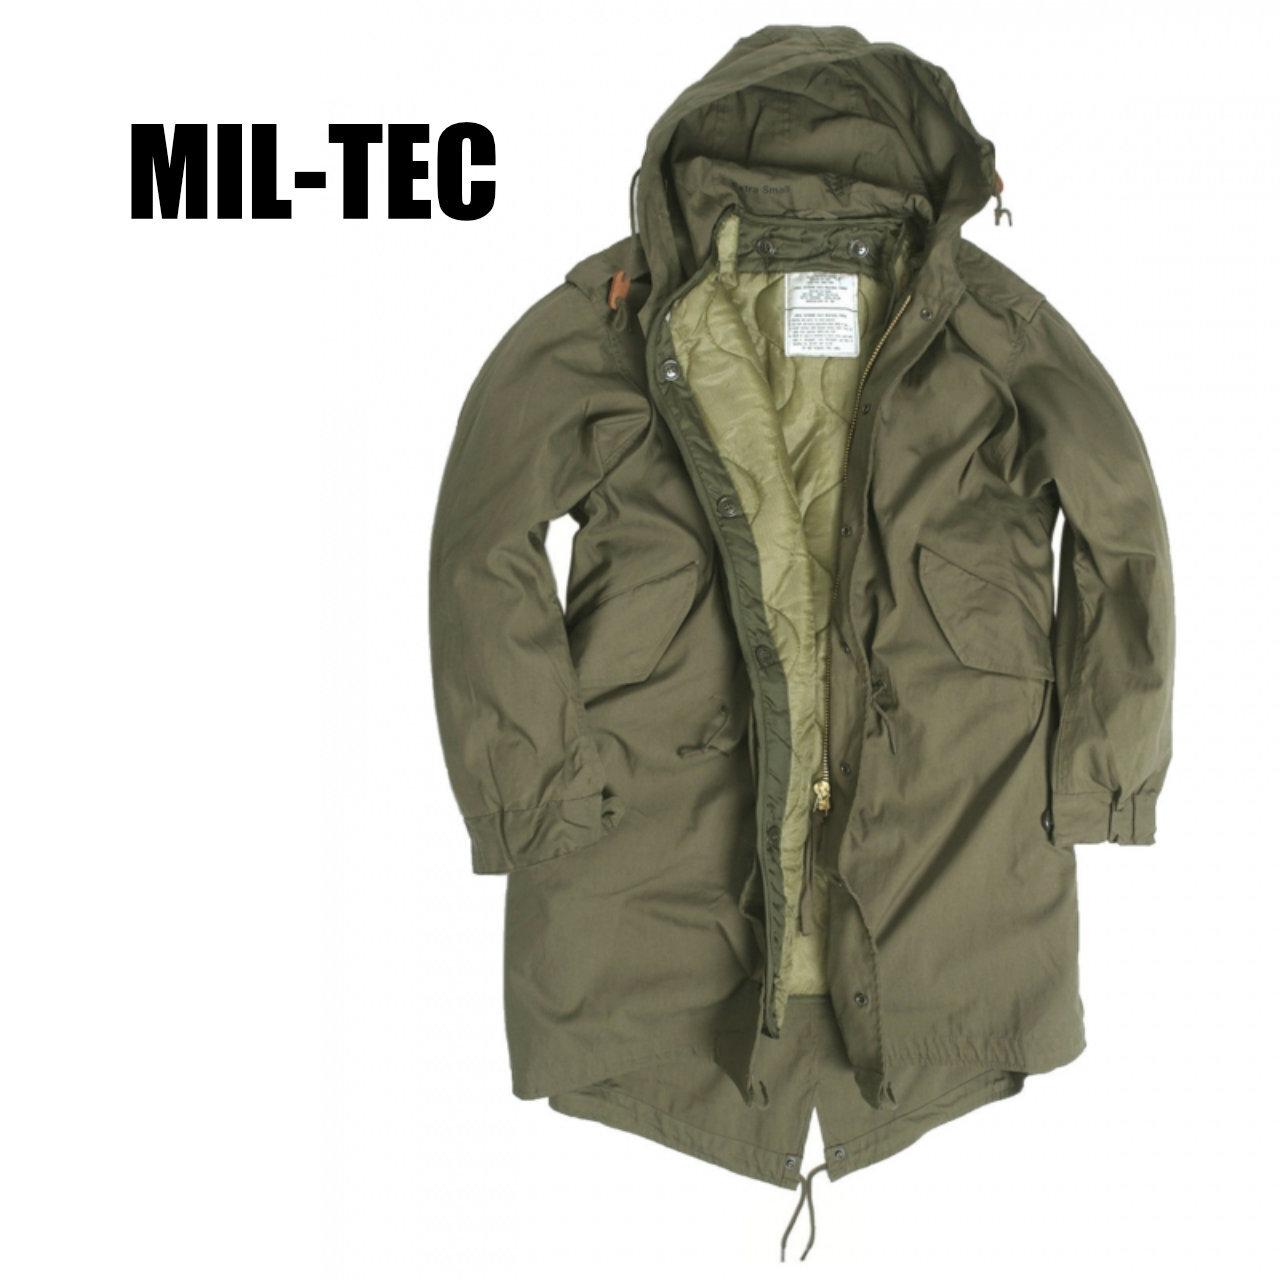 MIL-TEC M-51 フィールドパーカ 〈Olive Drab〉